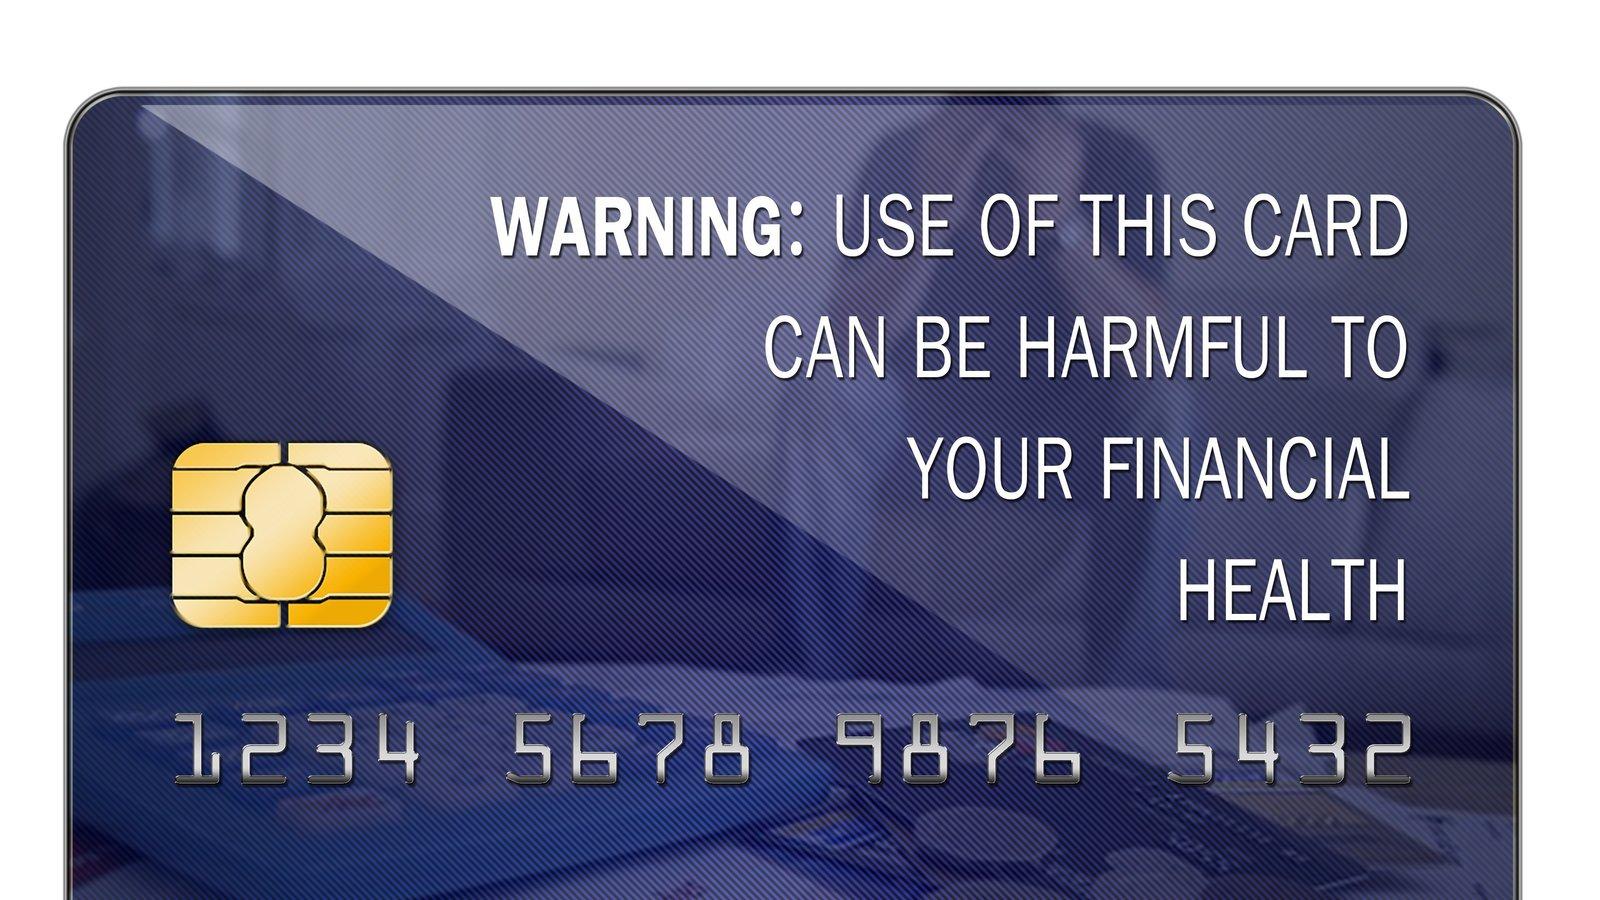 Petition · Visa: Put Warnings on Credit Cards · Change.org